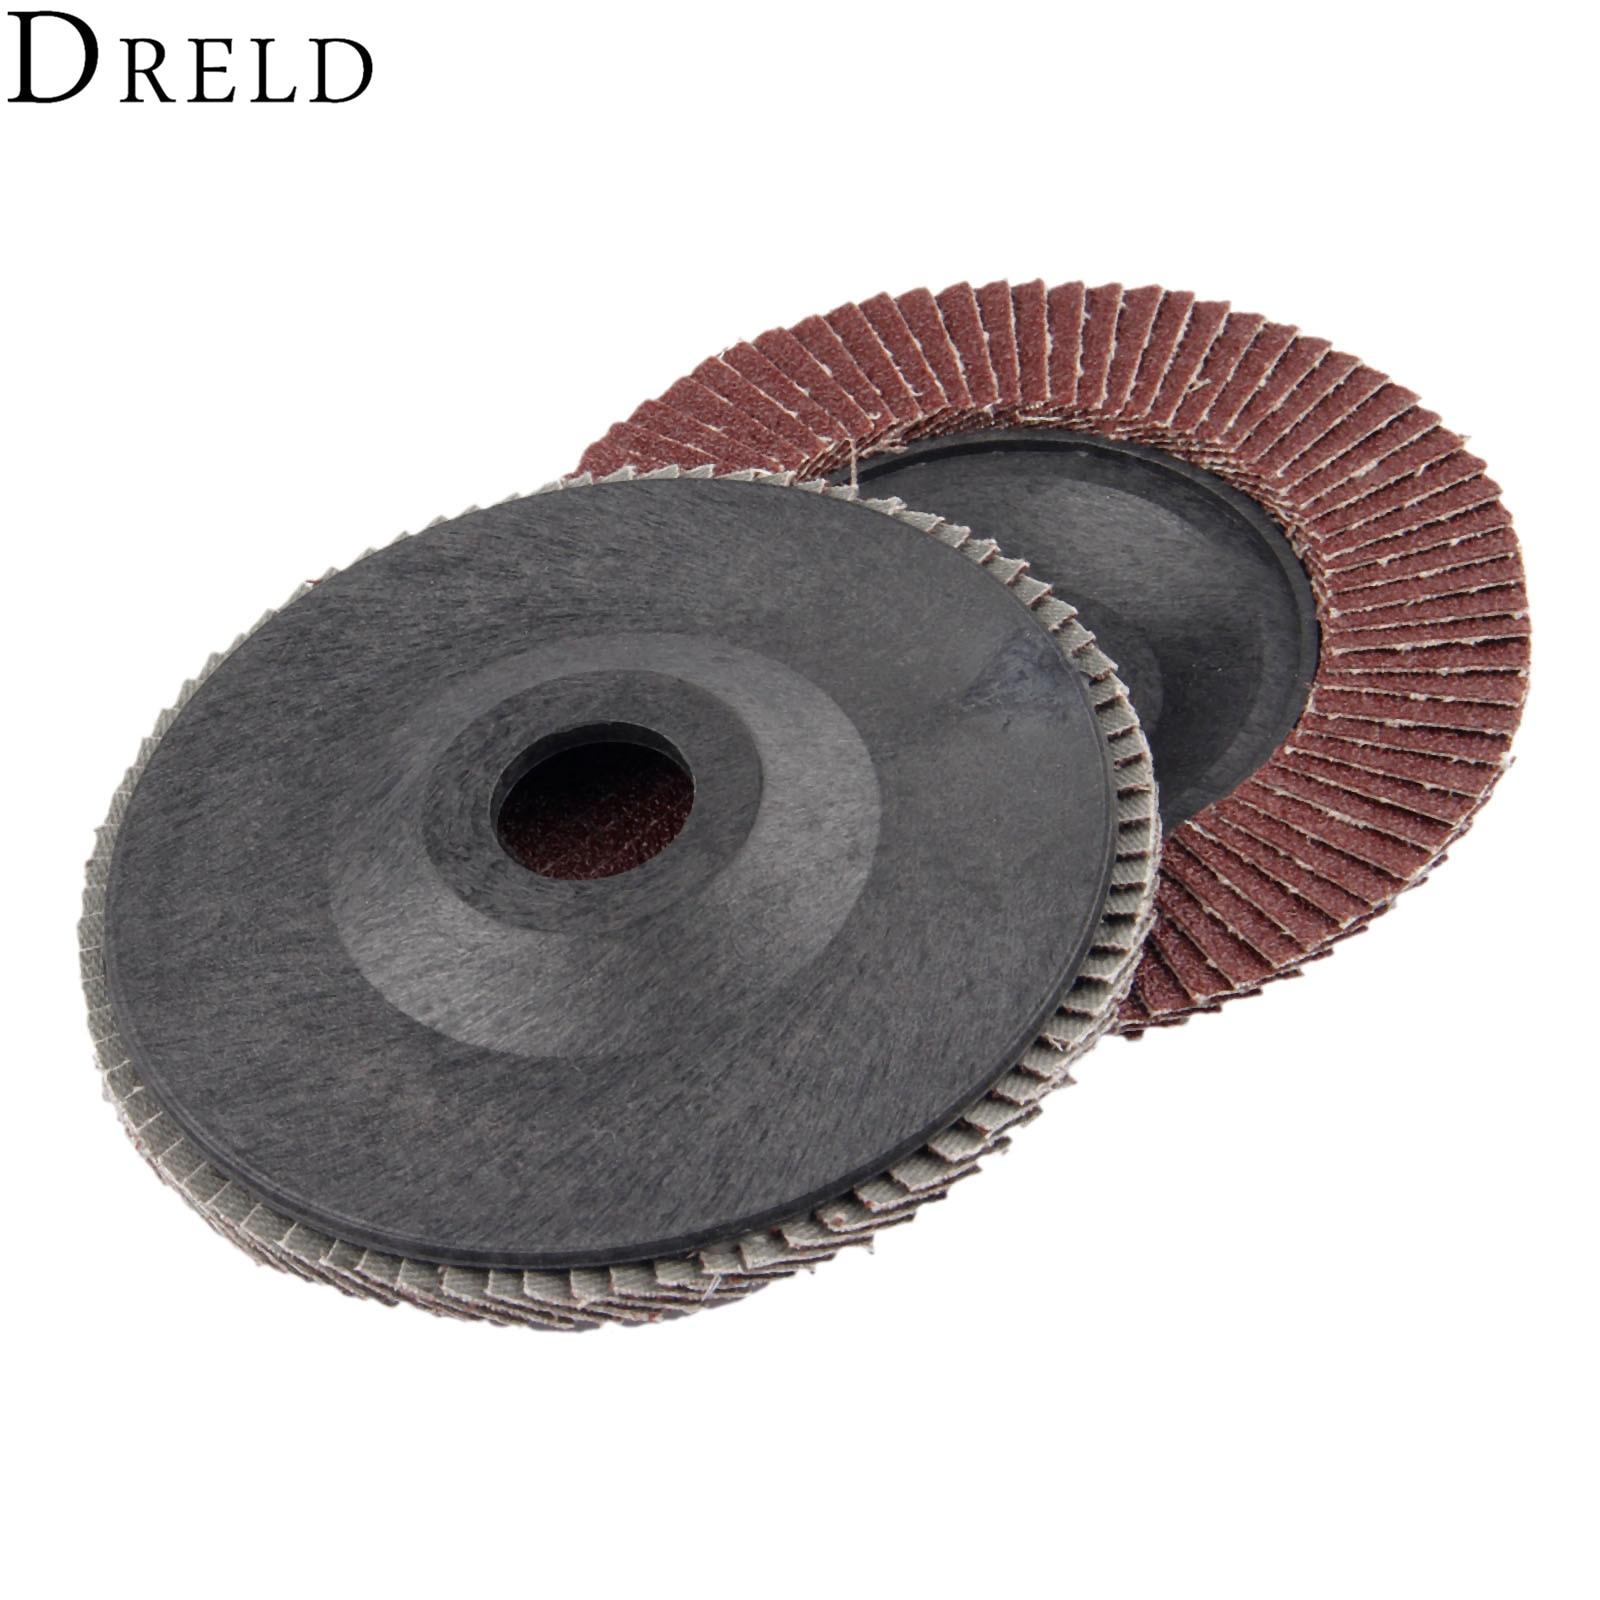 DRELD 1Pc 5 Inch 125mm Sanding Flap Discs Polishing Grinding Wheel Abrasive Tools Grit 60 For Angle Grinder Dremel Rotary Tool